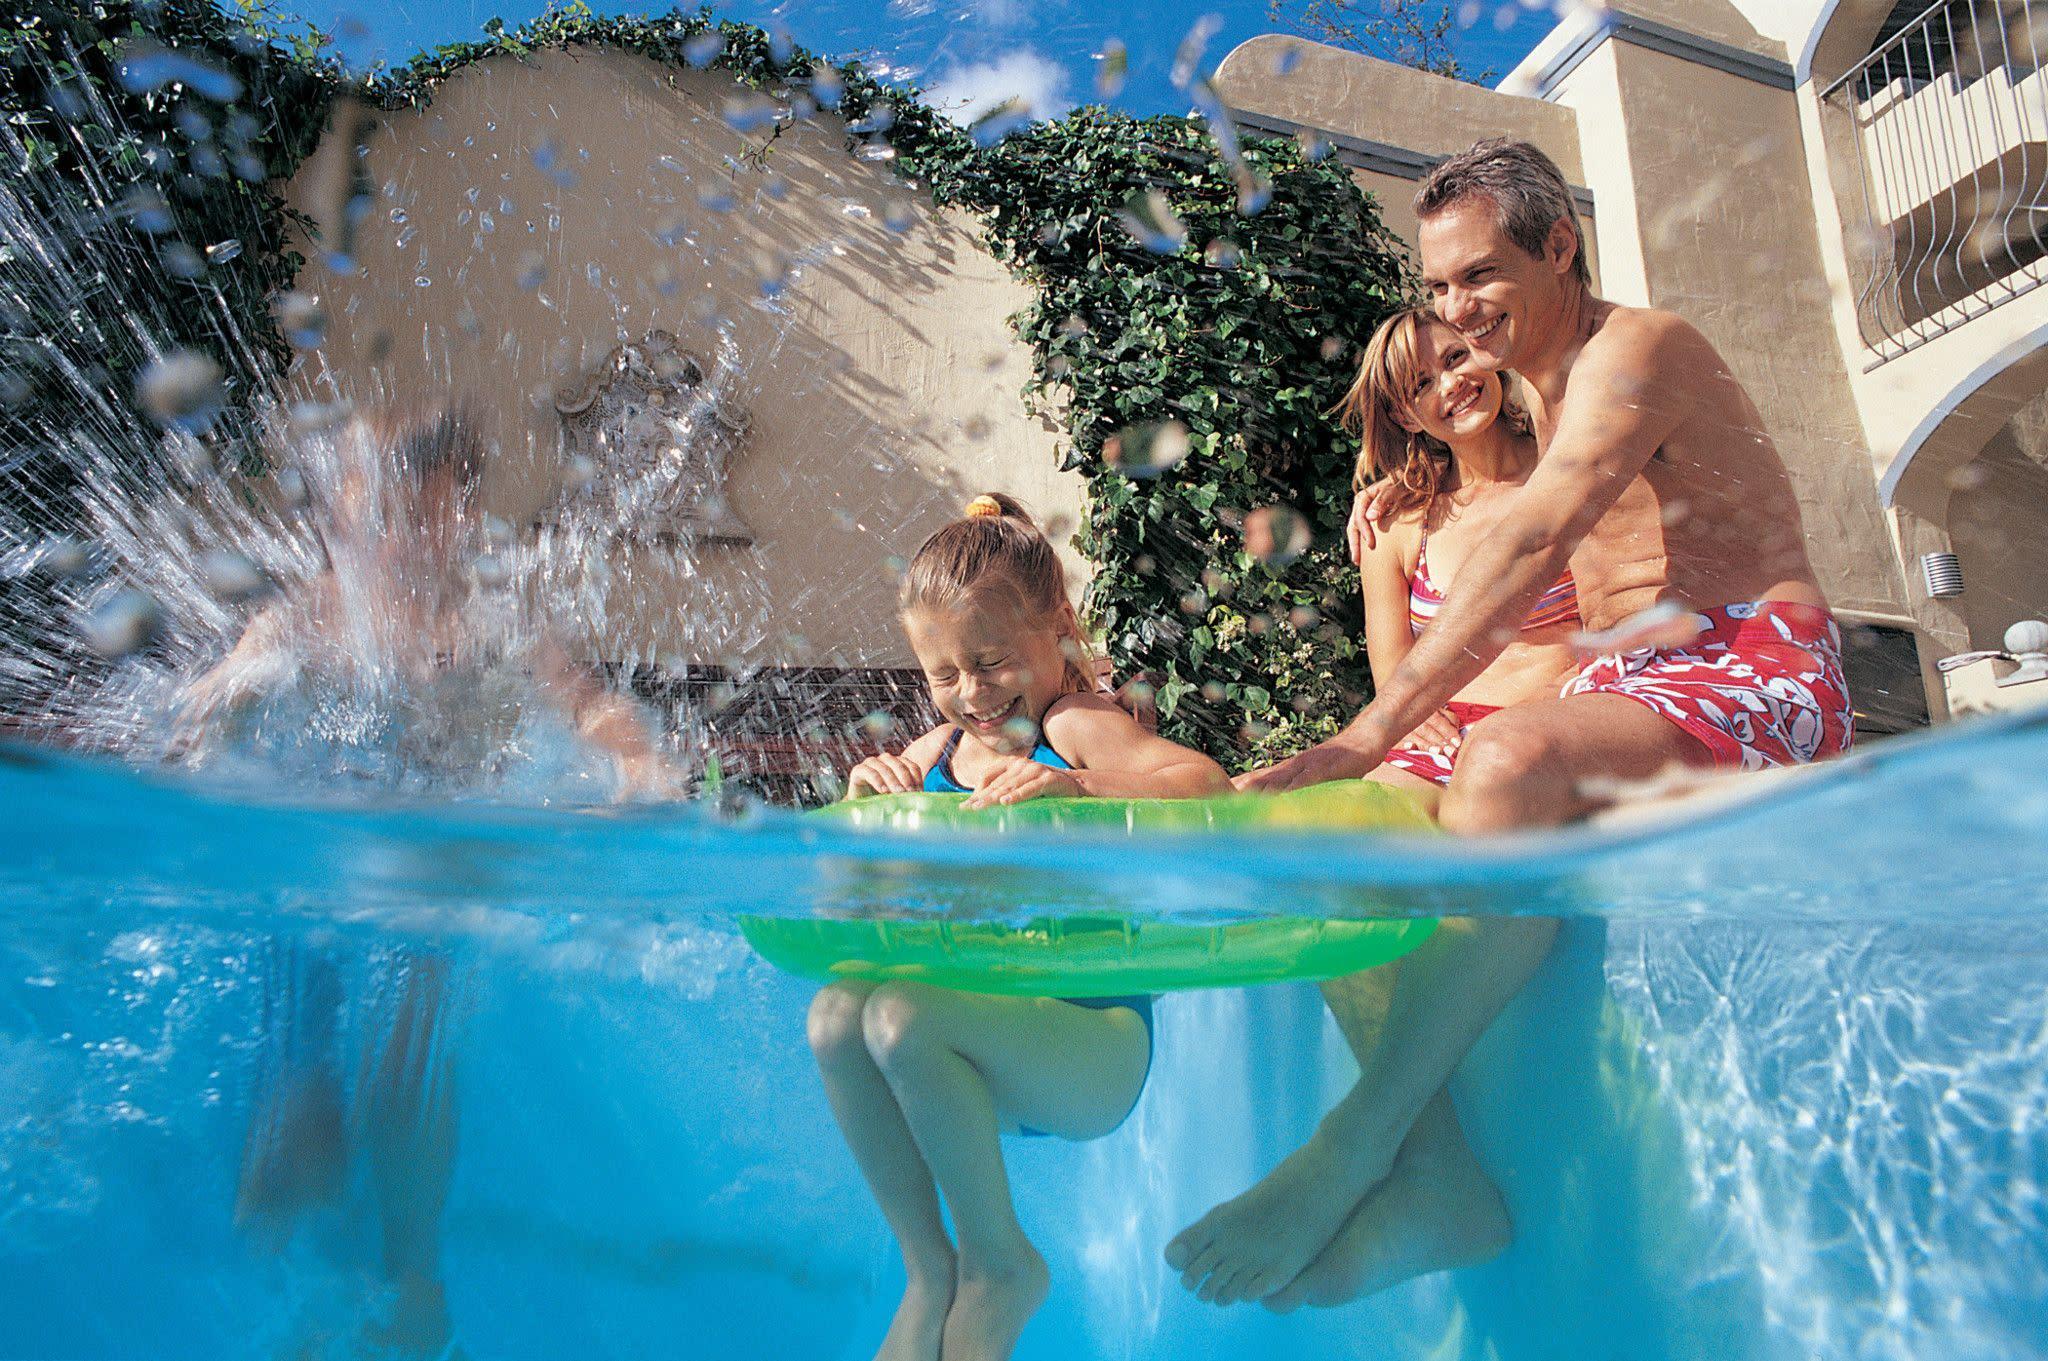 Make a Splash at Resort Pools in Orlando